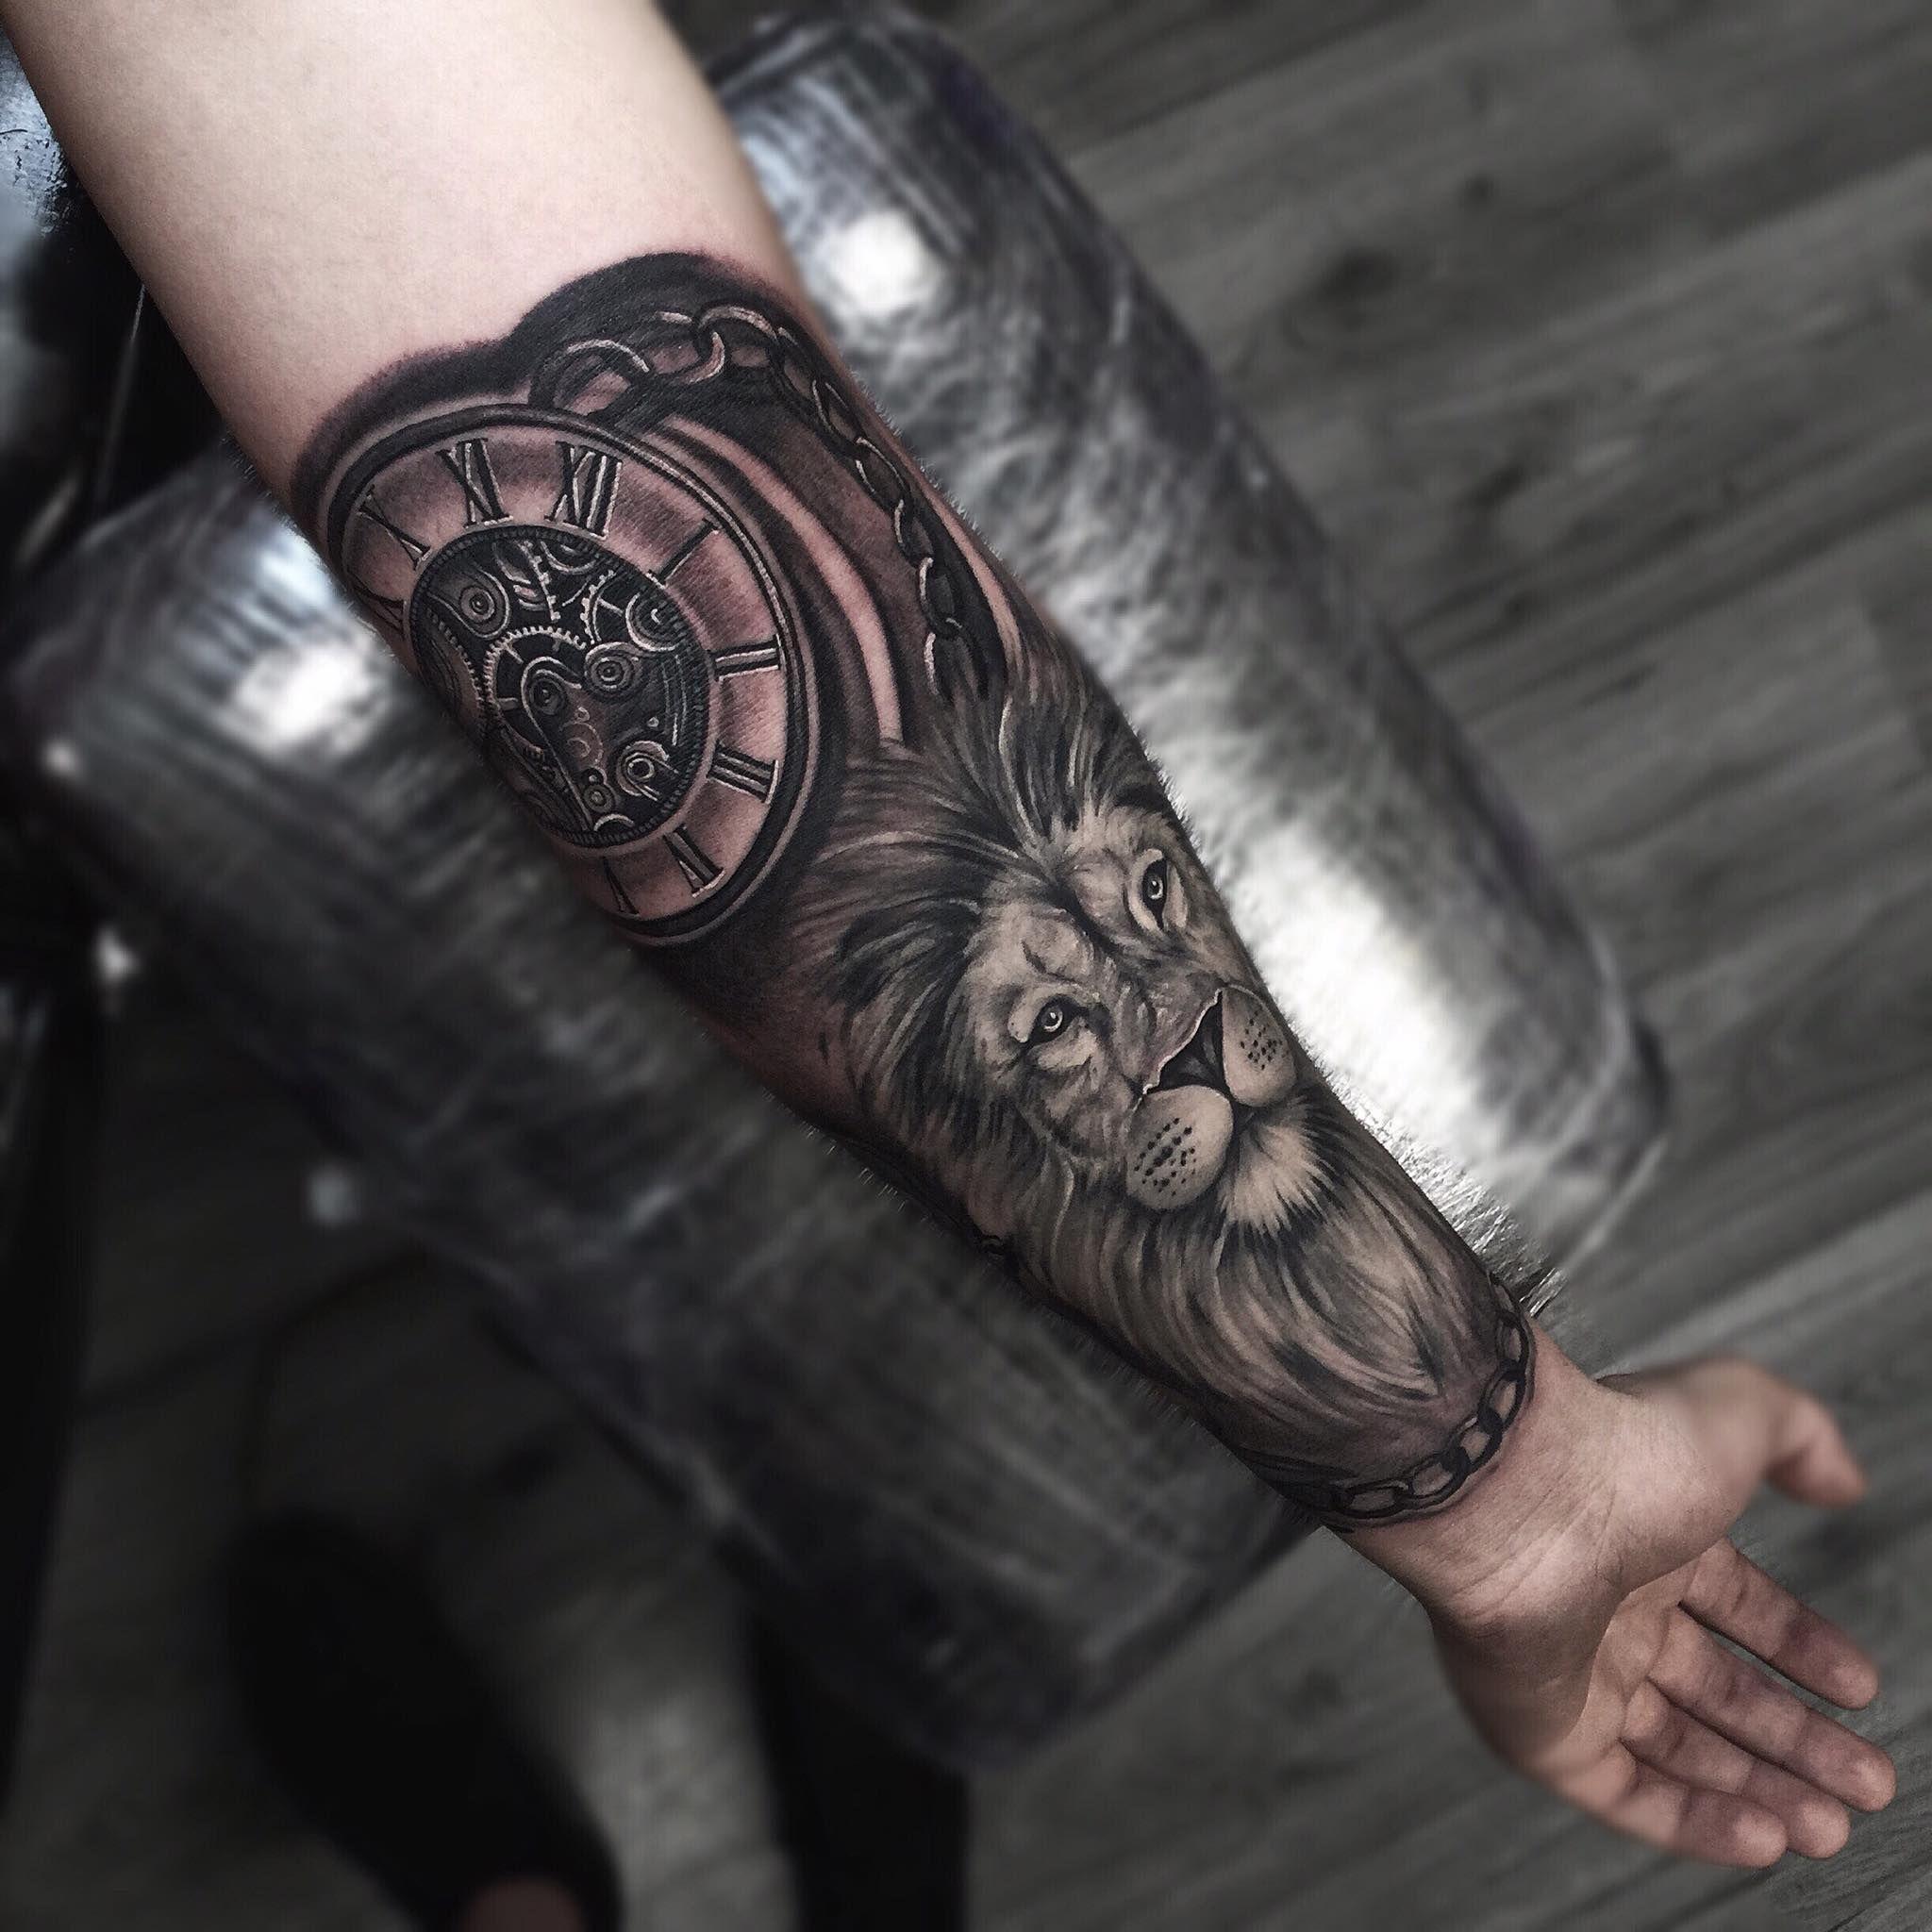 Lion Tattoo On Inside Of Arm Arm Tattoo Sites